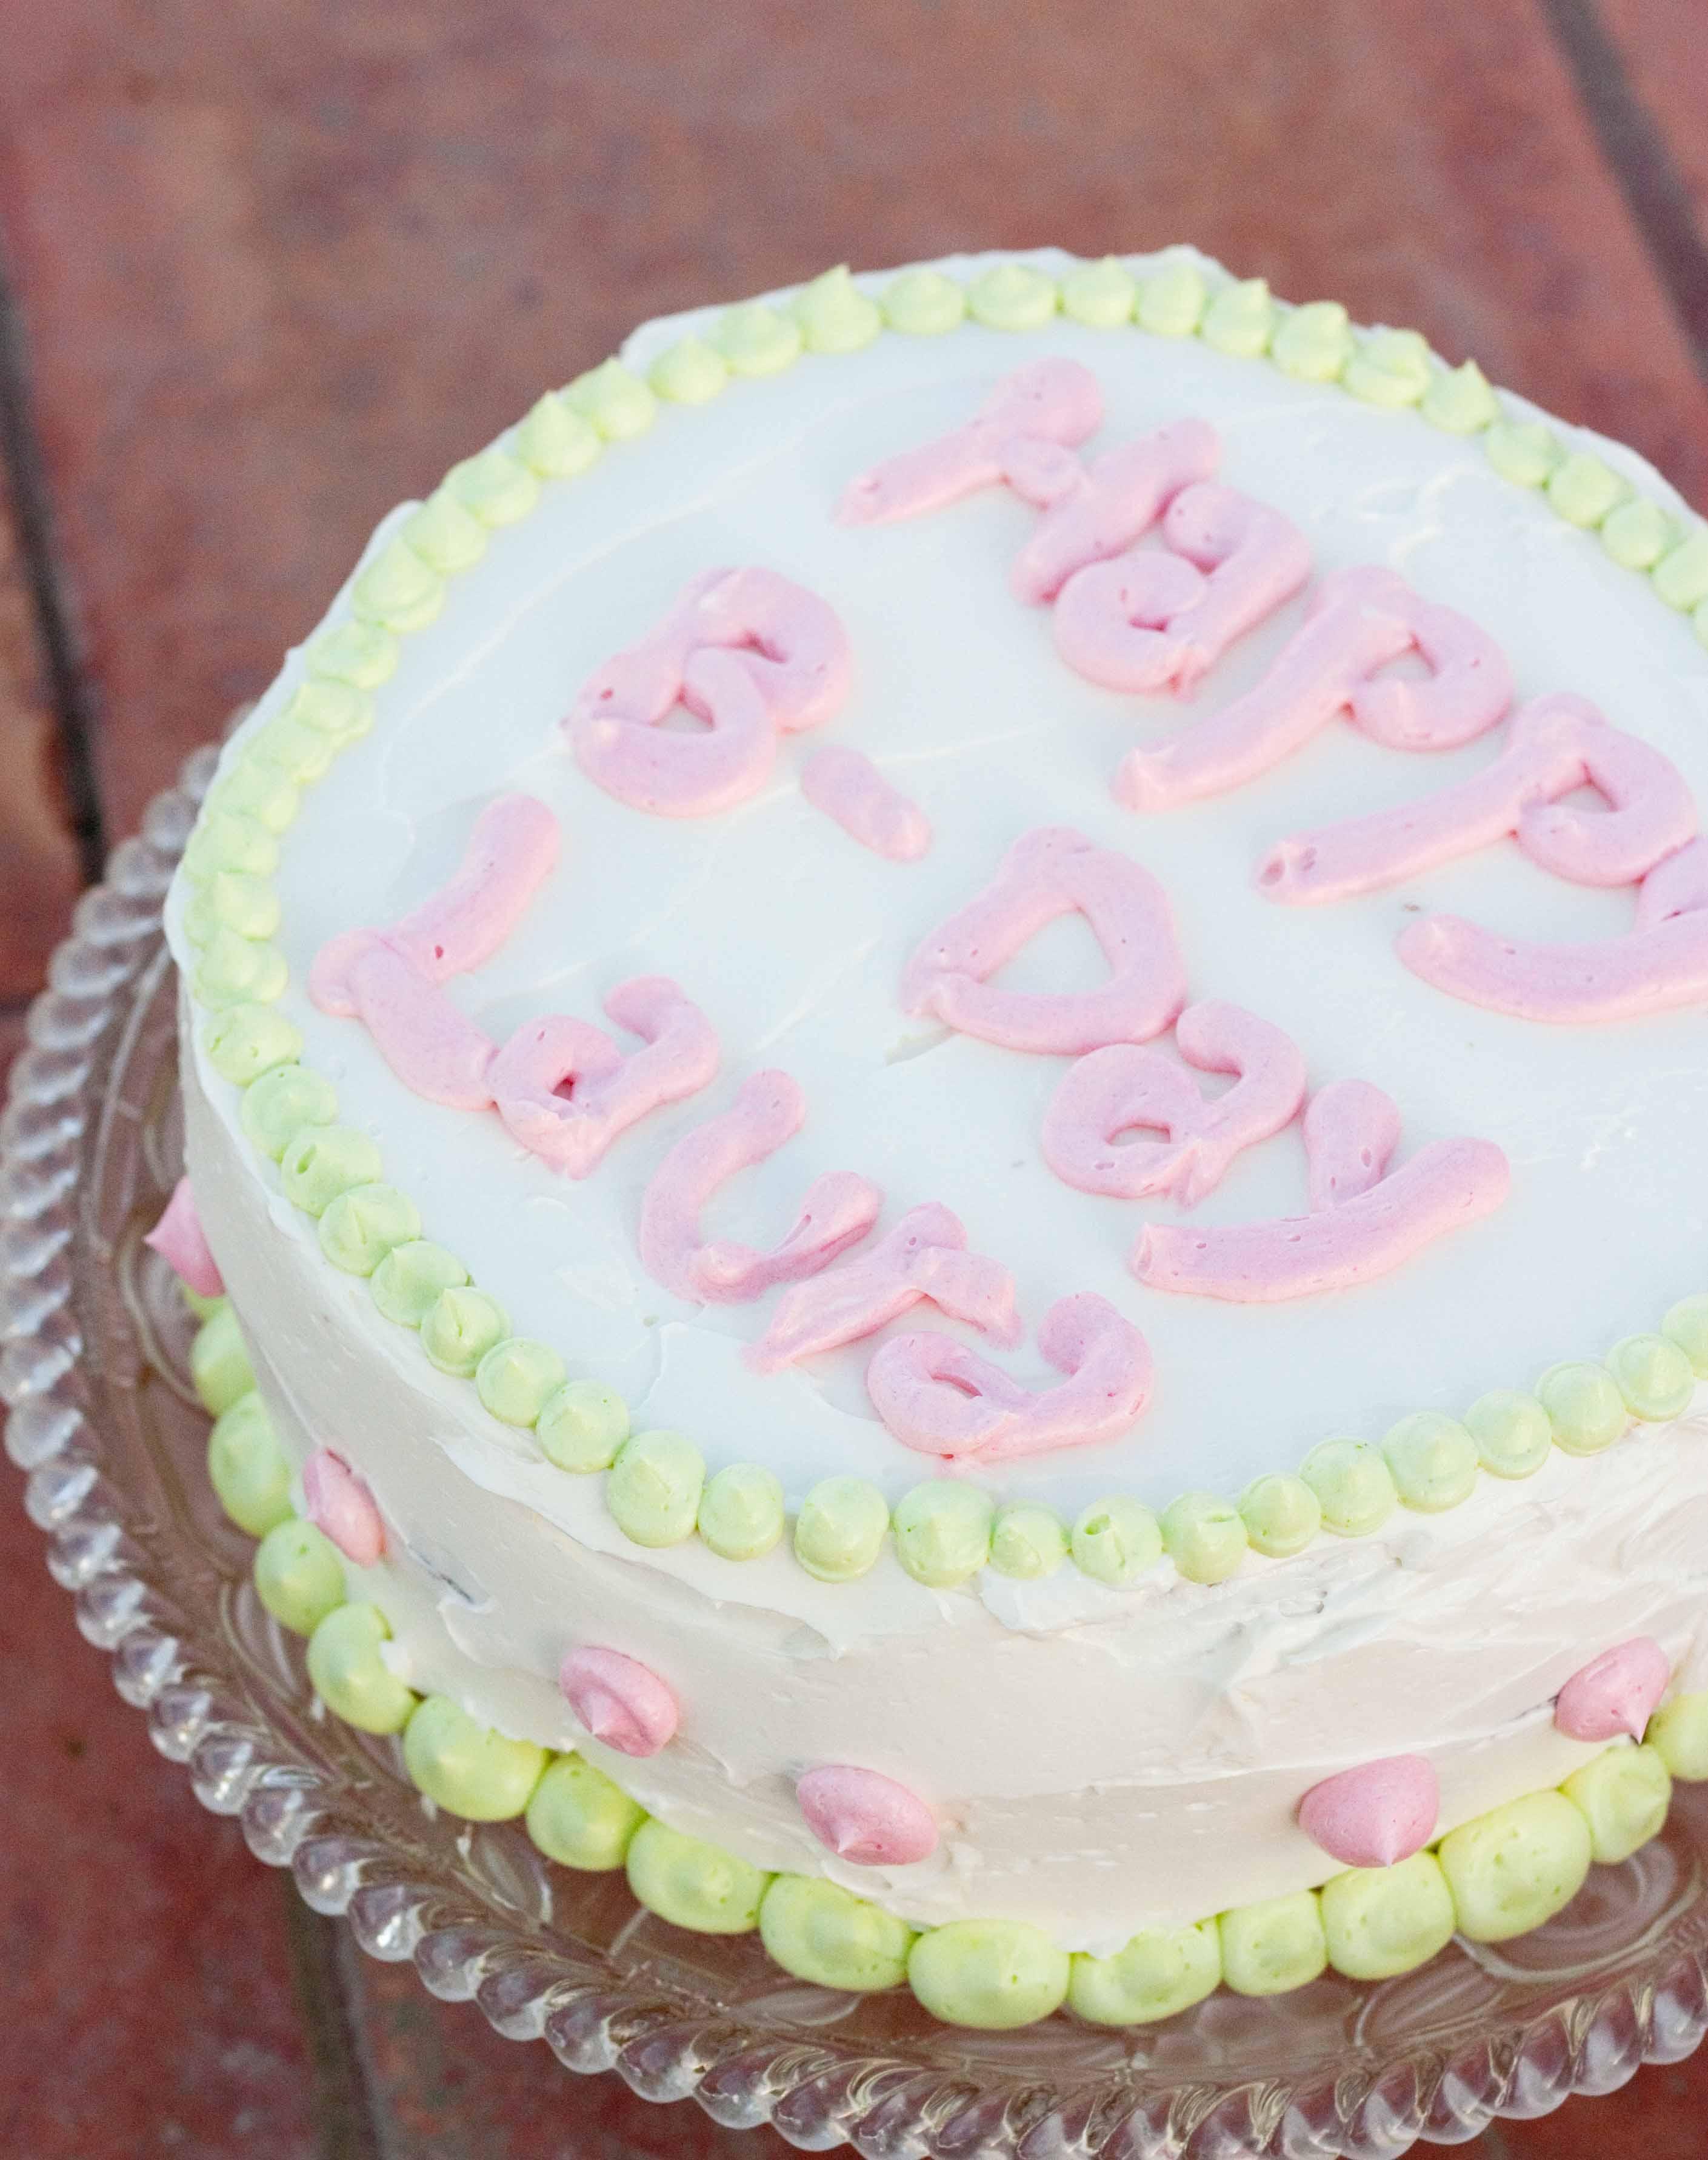 Cake Decorating Italian Buttercream : Italian Buttercream Birthday Cake   Foodologie